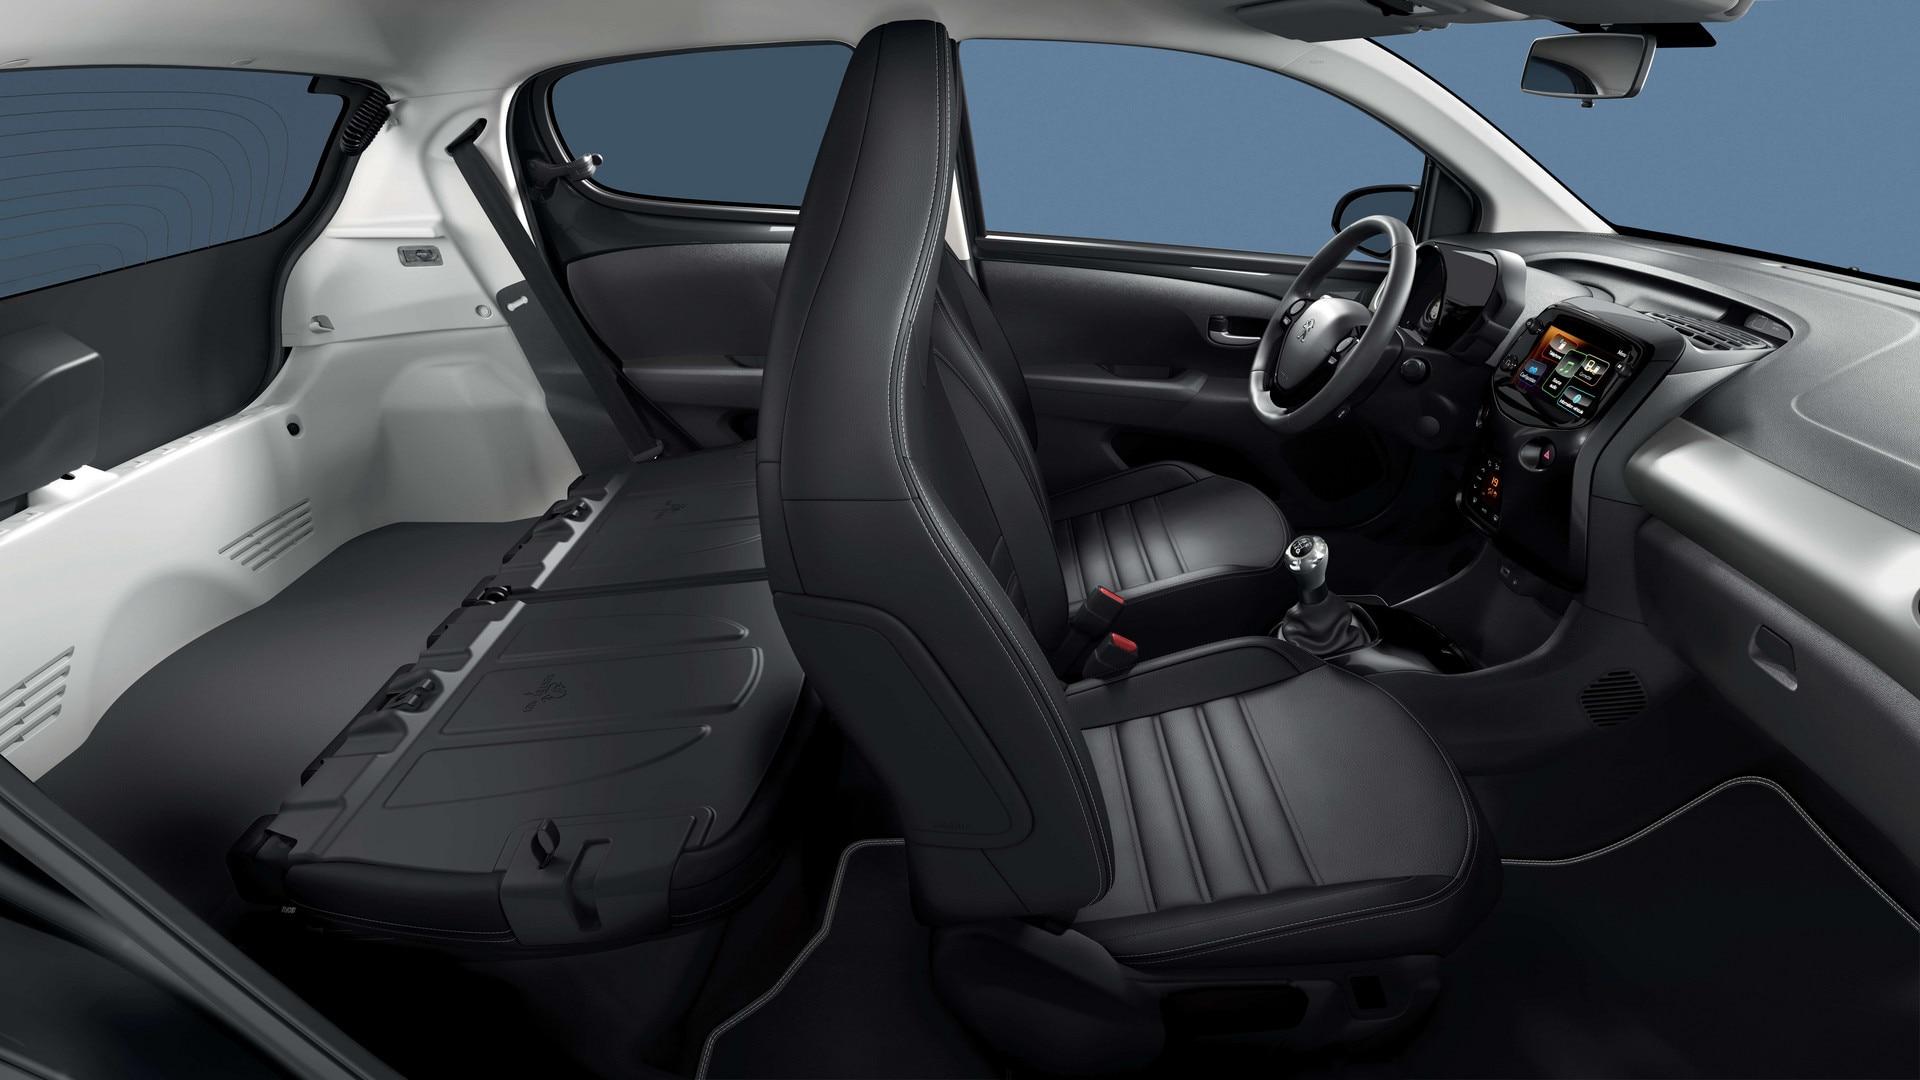 Peugeot 108 O Citadino Personalizavel E Conectado